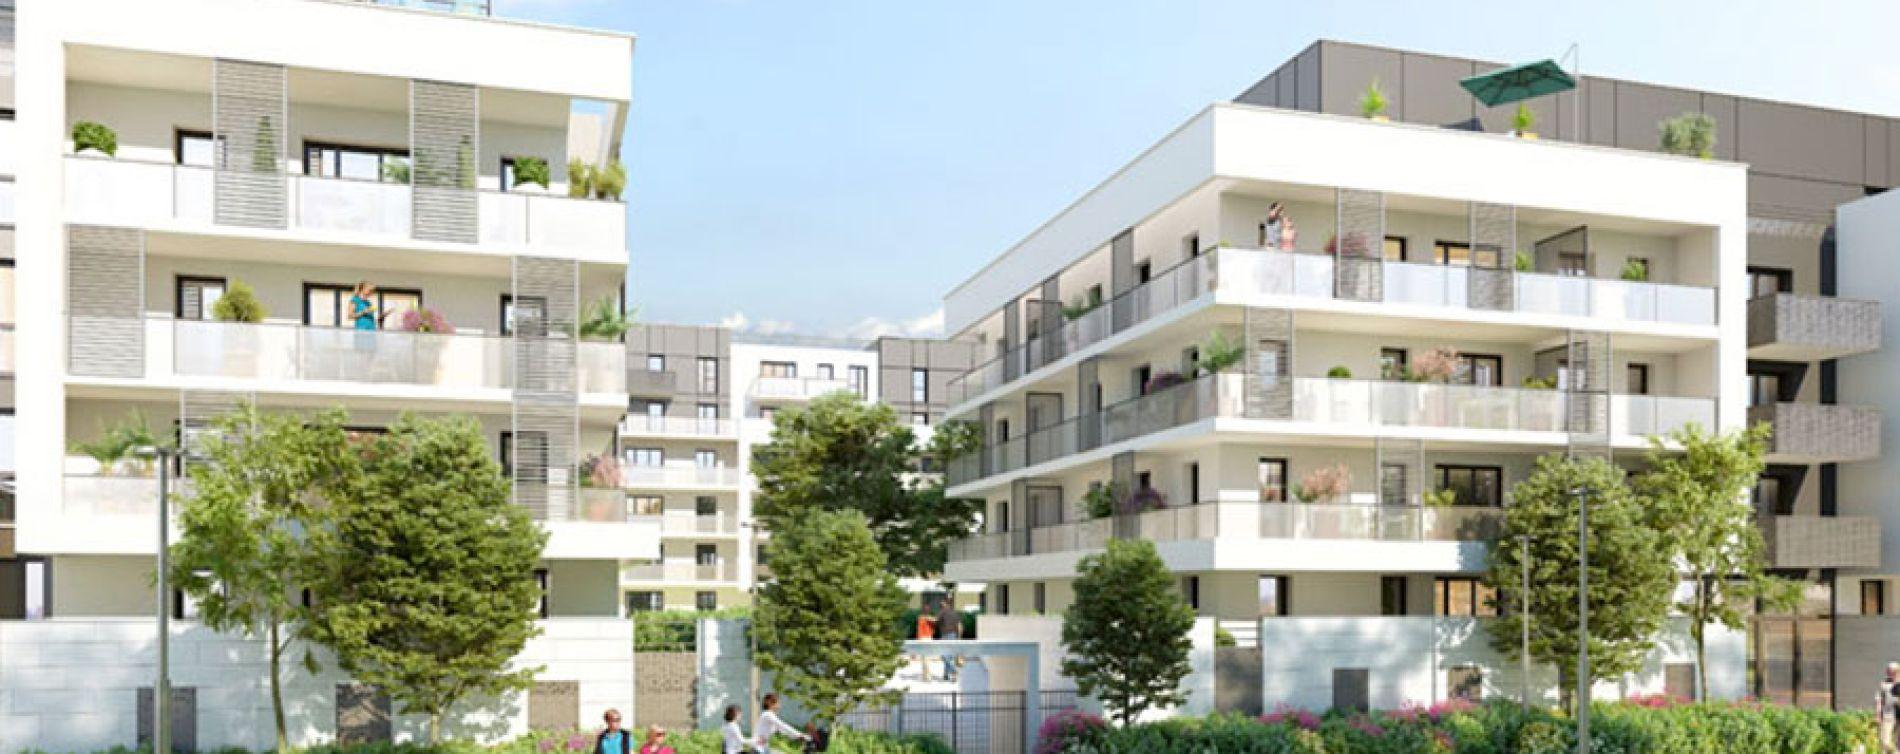 Résidence Green Life à Bussy-Saint-Georges